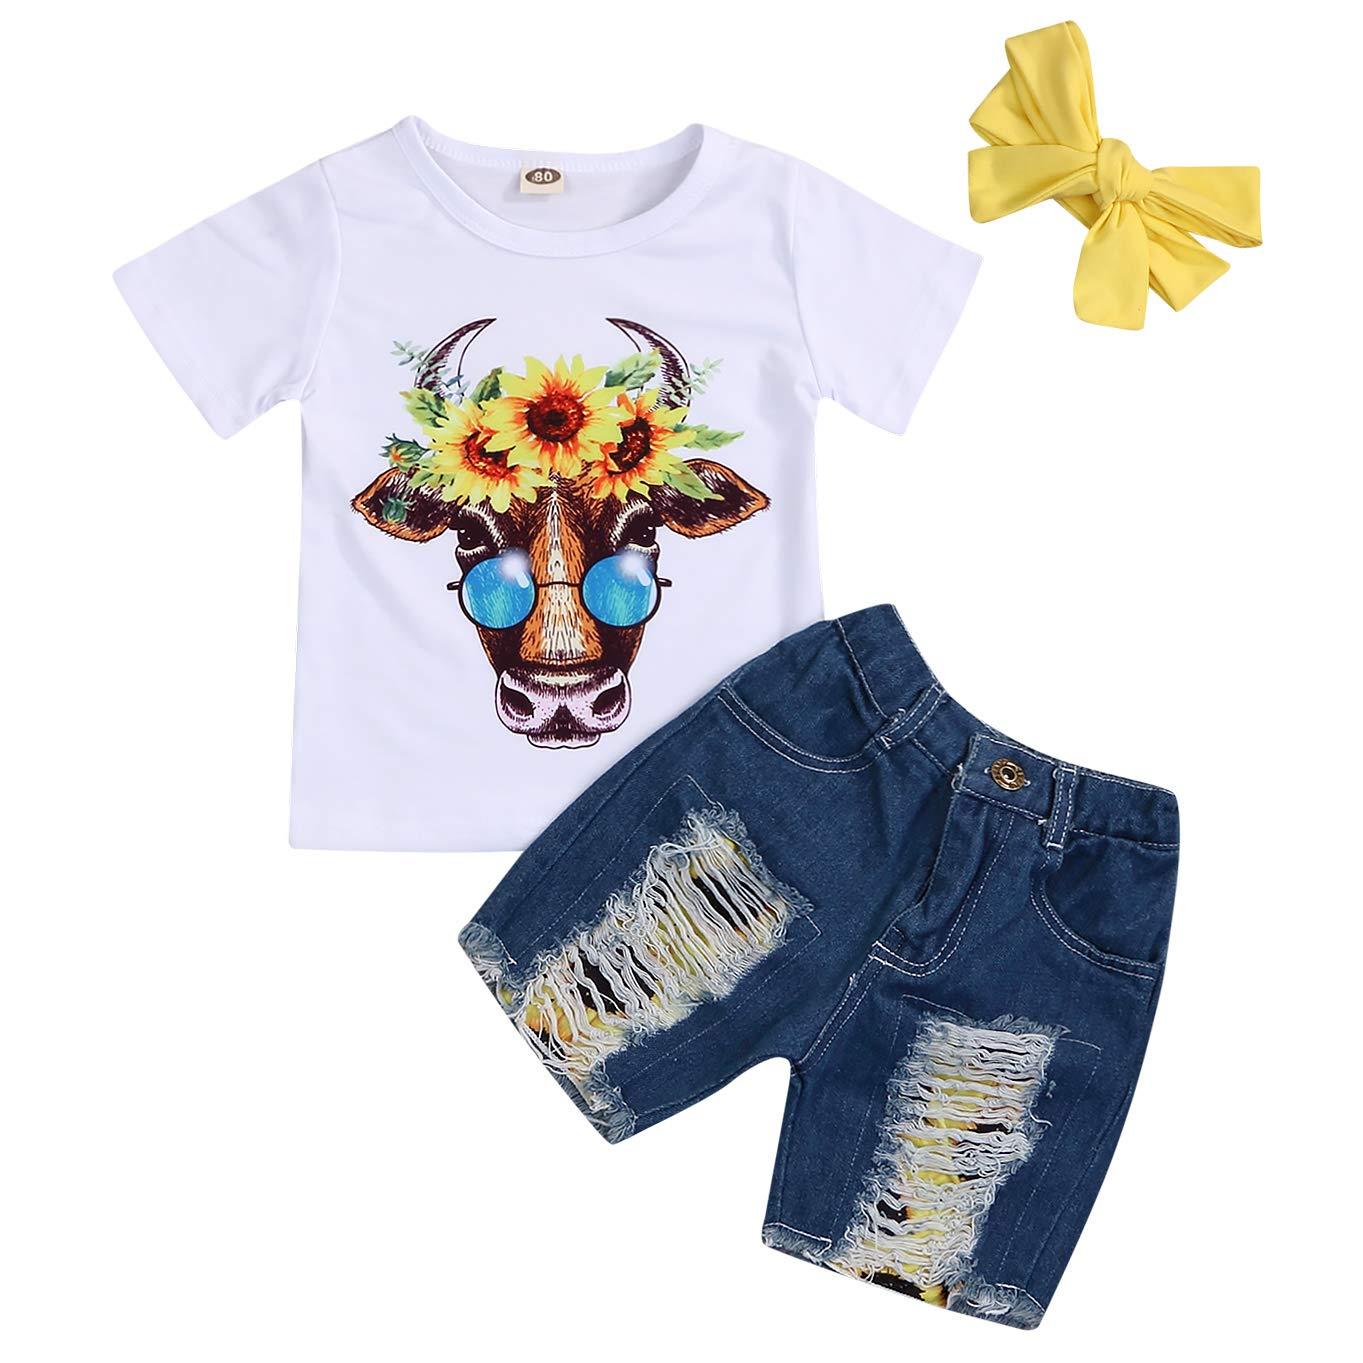 GRNSHTS Baby Girls Sunflower Shorts Set 3Pcs Infant Fly Sleeve Ruffled Shirt+Sunflower Diaper+Headband Summer Outfits